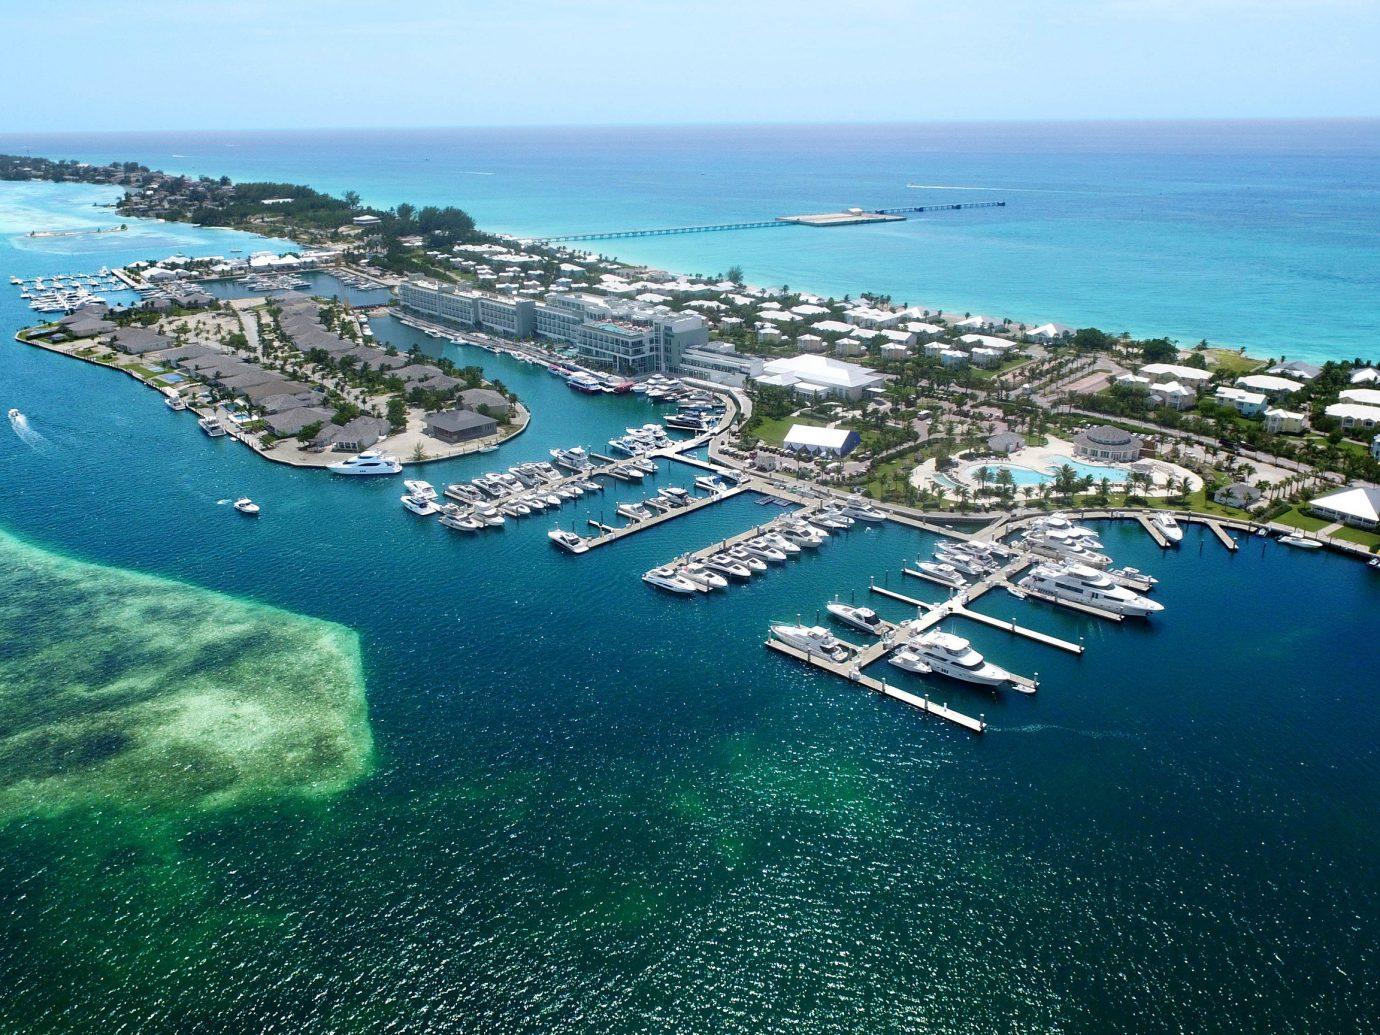 Hotels water sky Nature outdoor Ocean Coast Sea reef aerial photography marina horizon bay port dock channel cape shore caribbean archipelago islet promontory Island overlooking